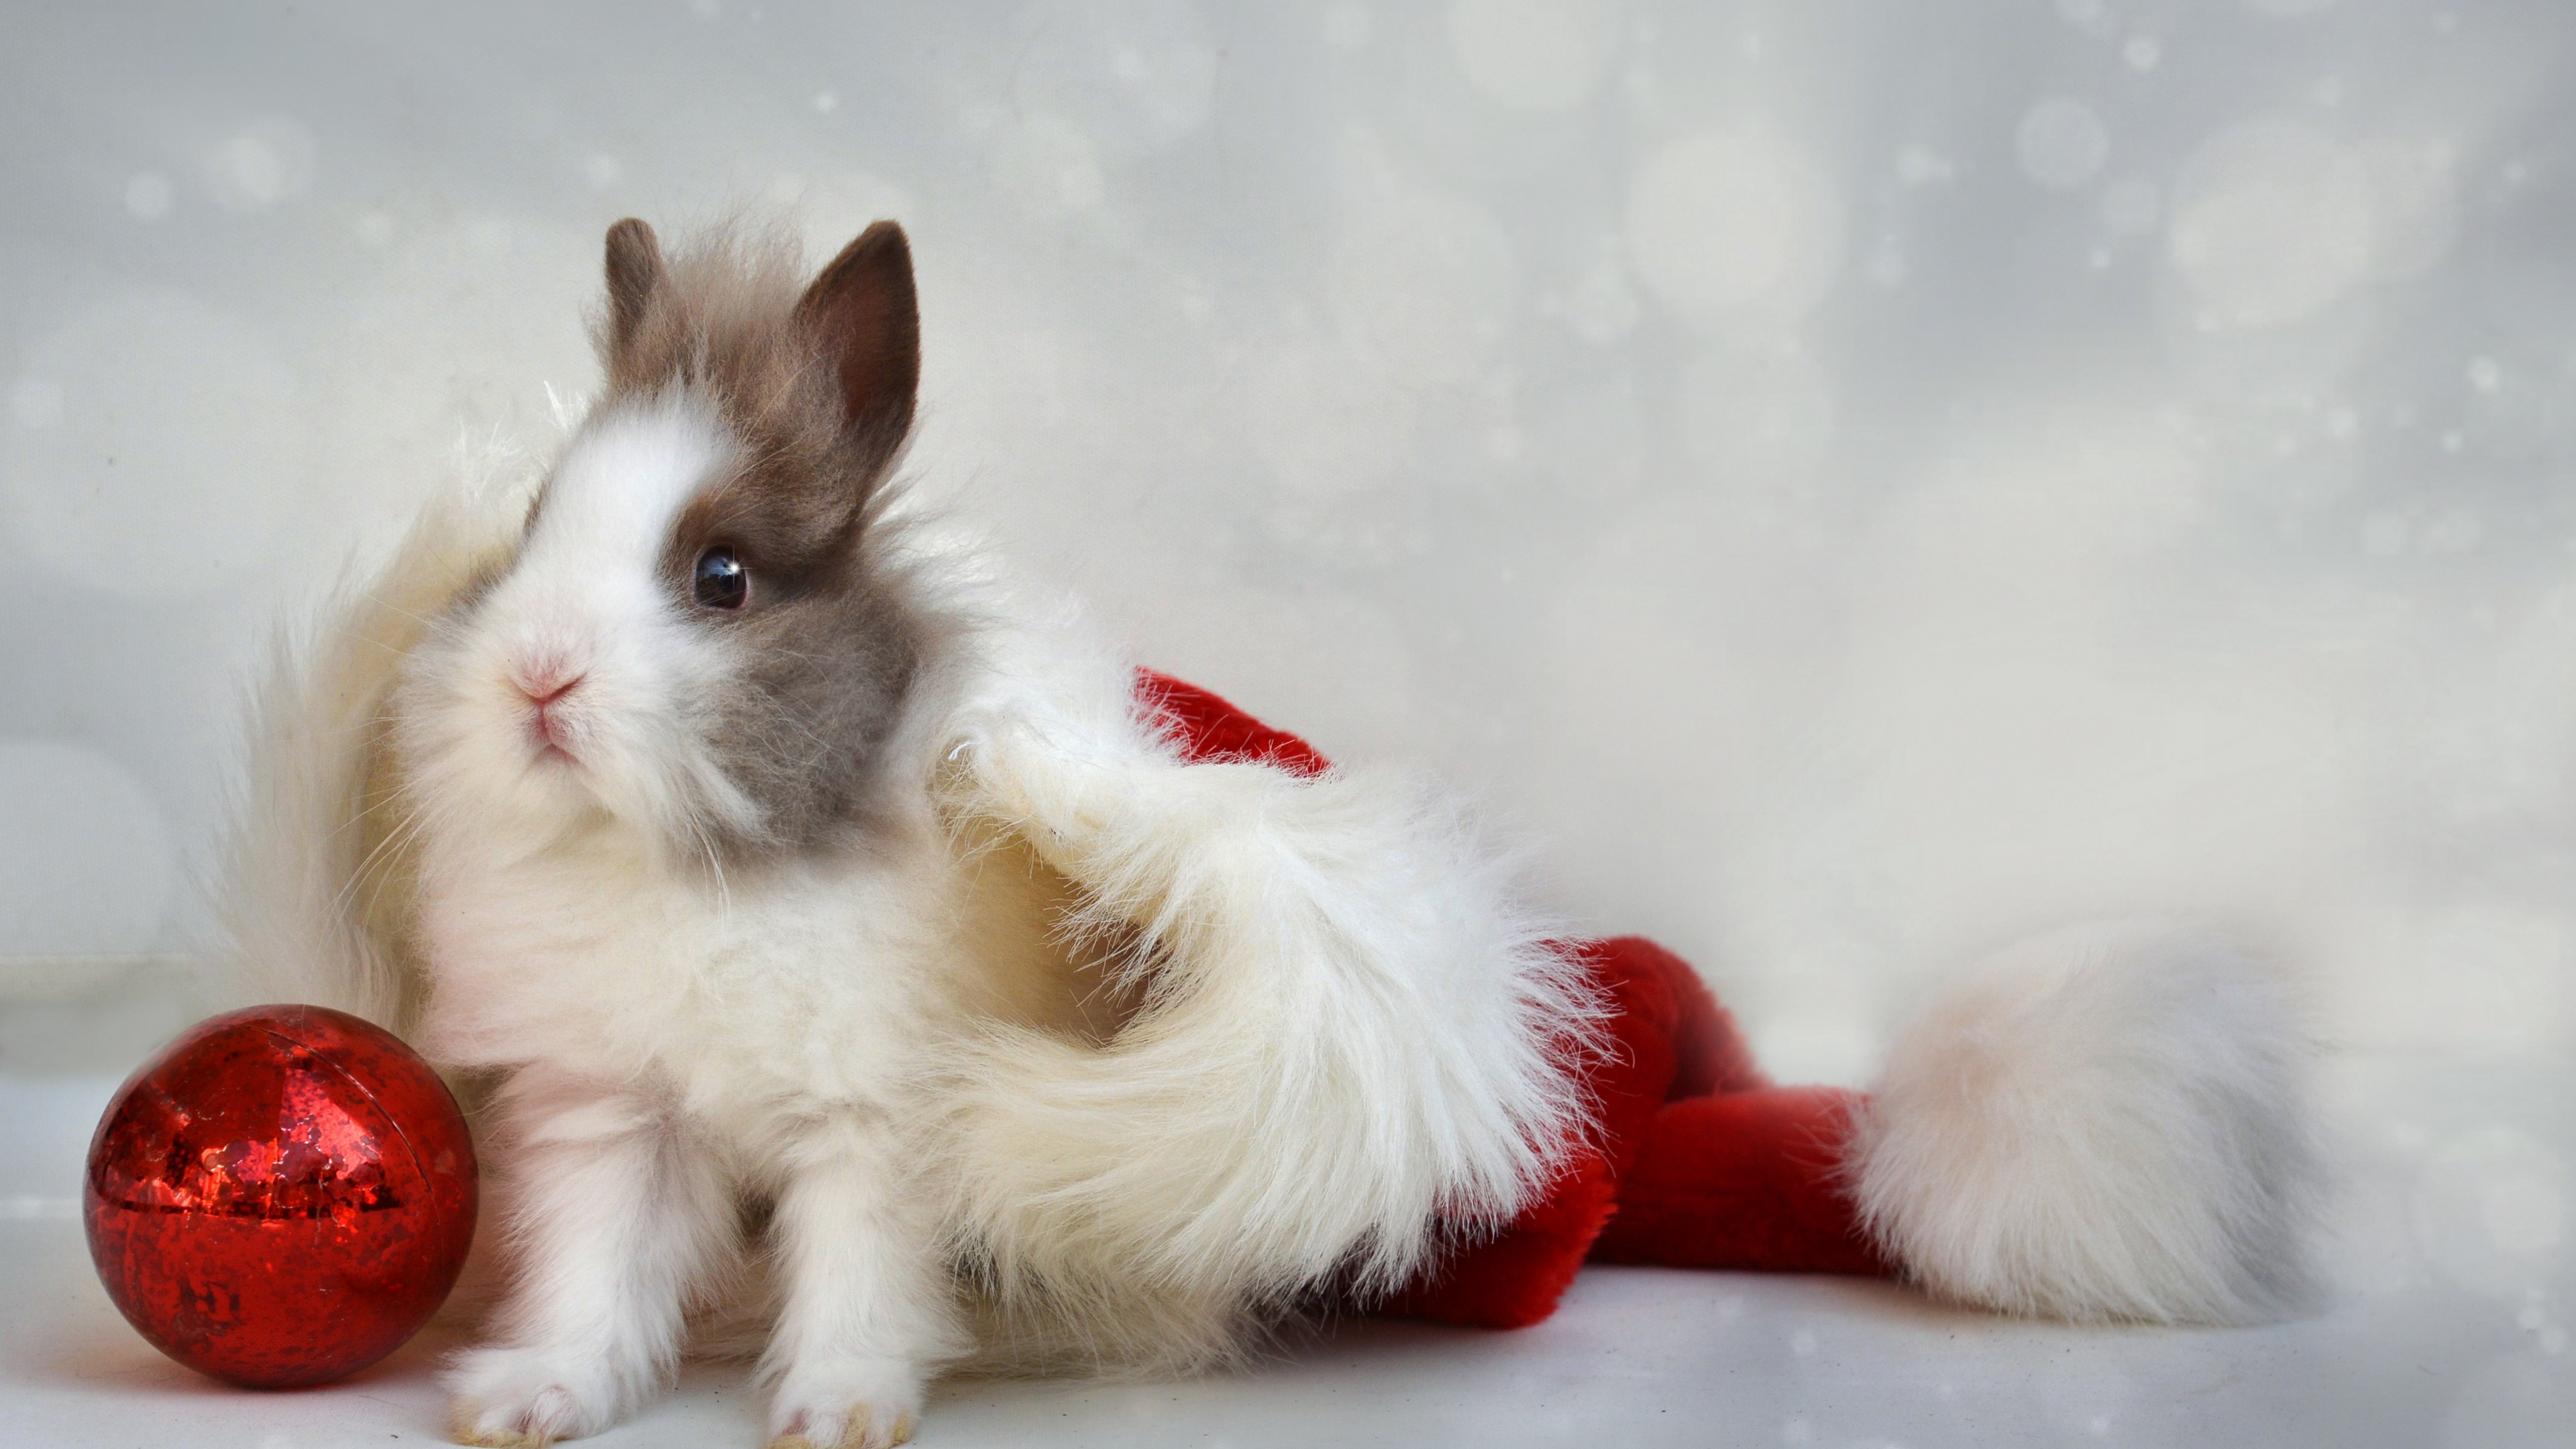 rabbit new year ball 4k 1538344868 - rabbit, new year, ball 4k - Rabbit, new year, Ball